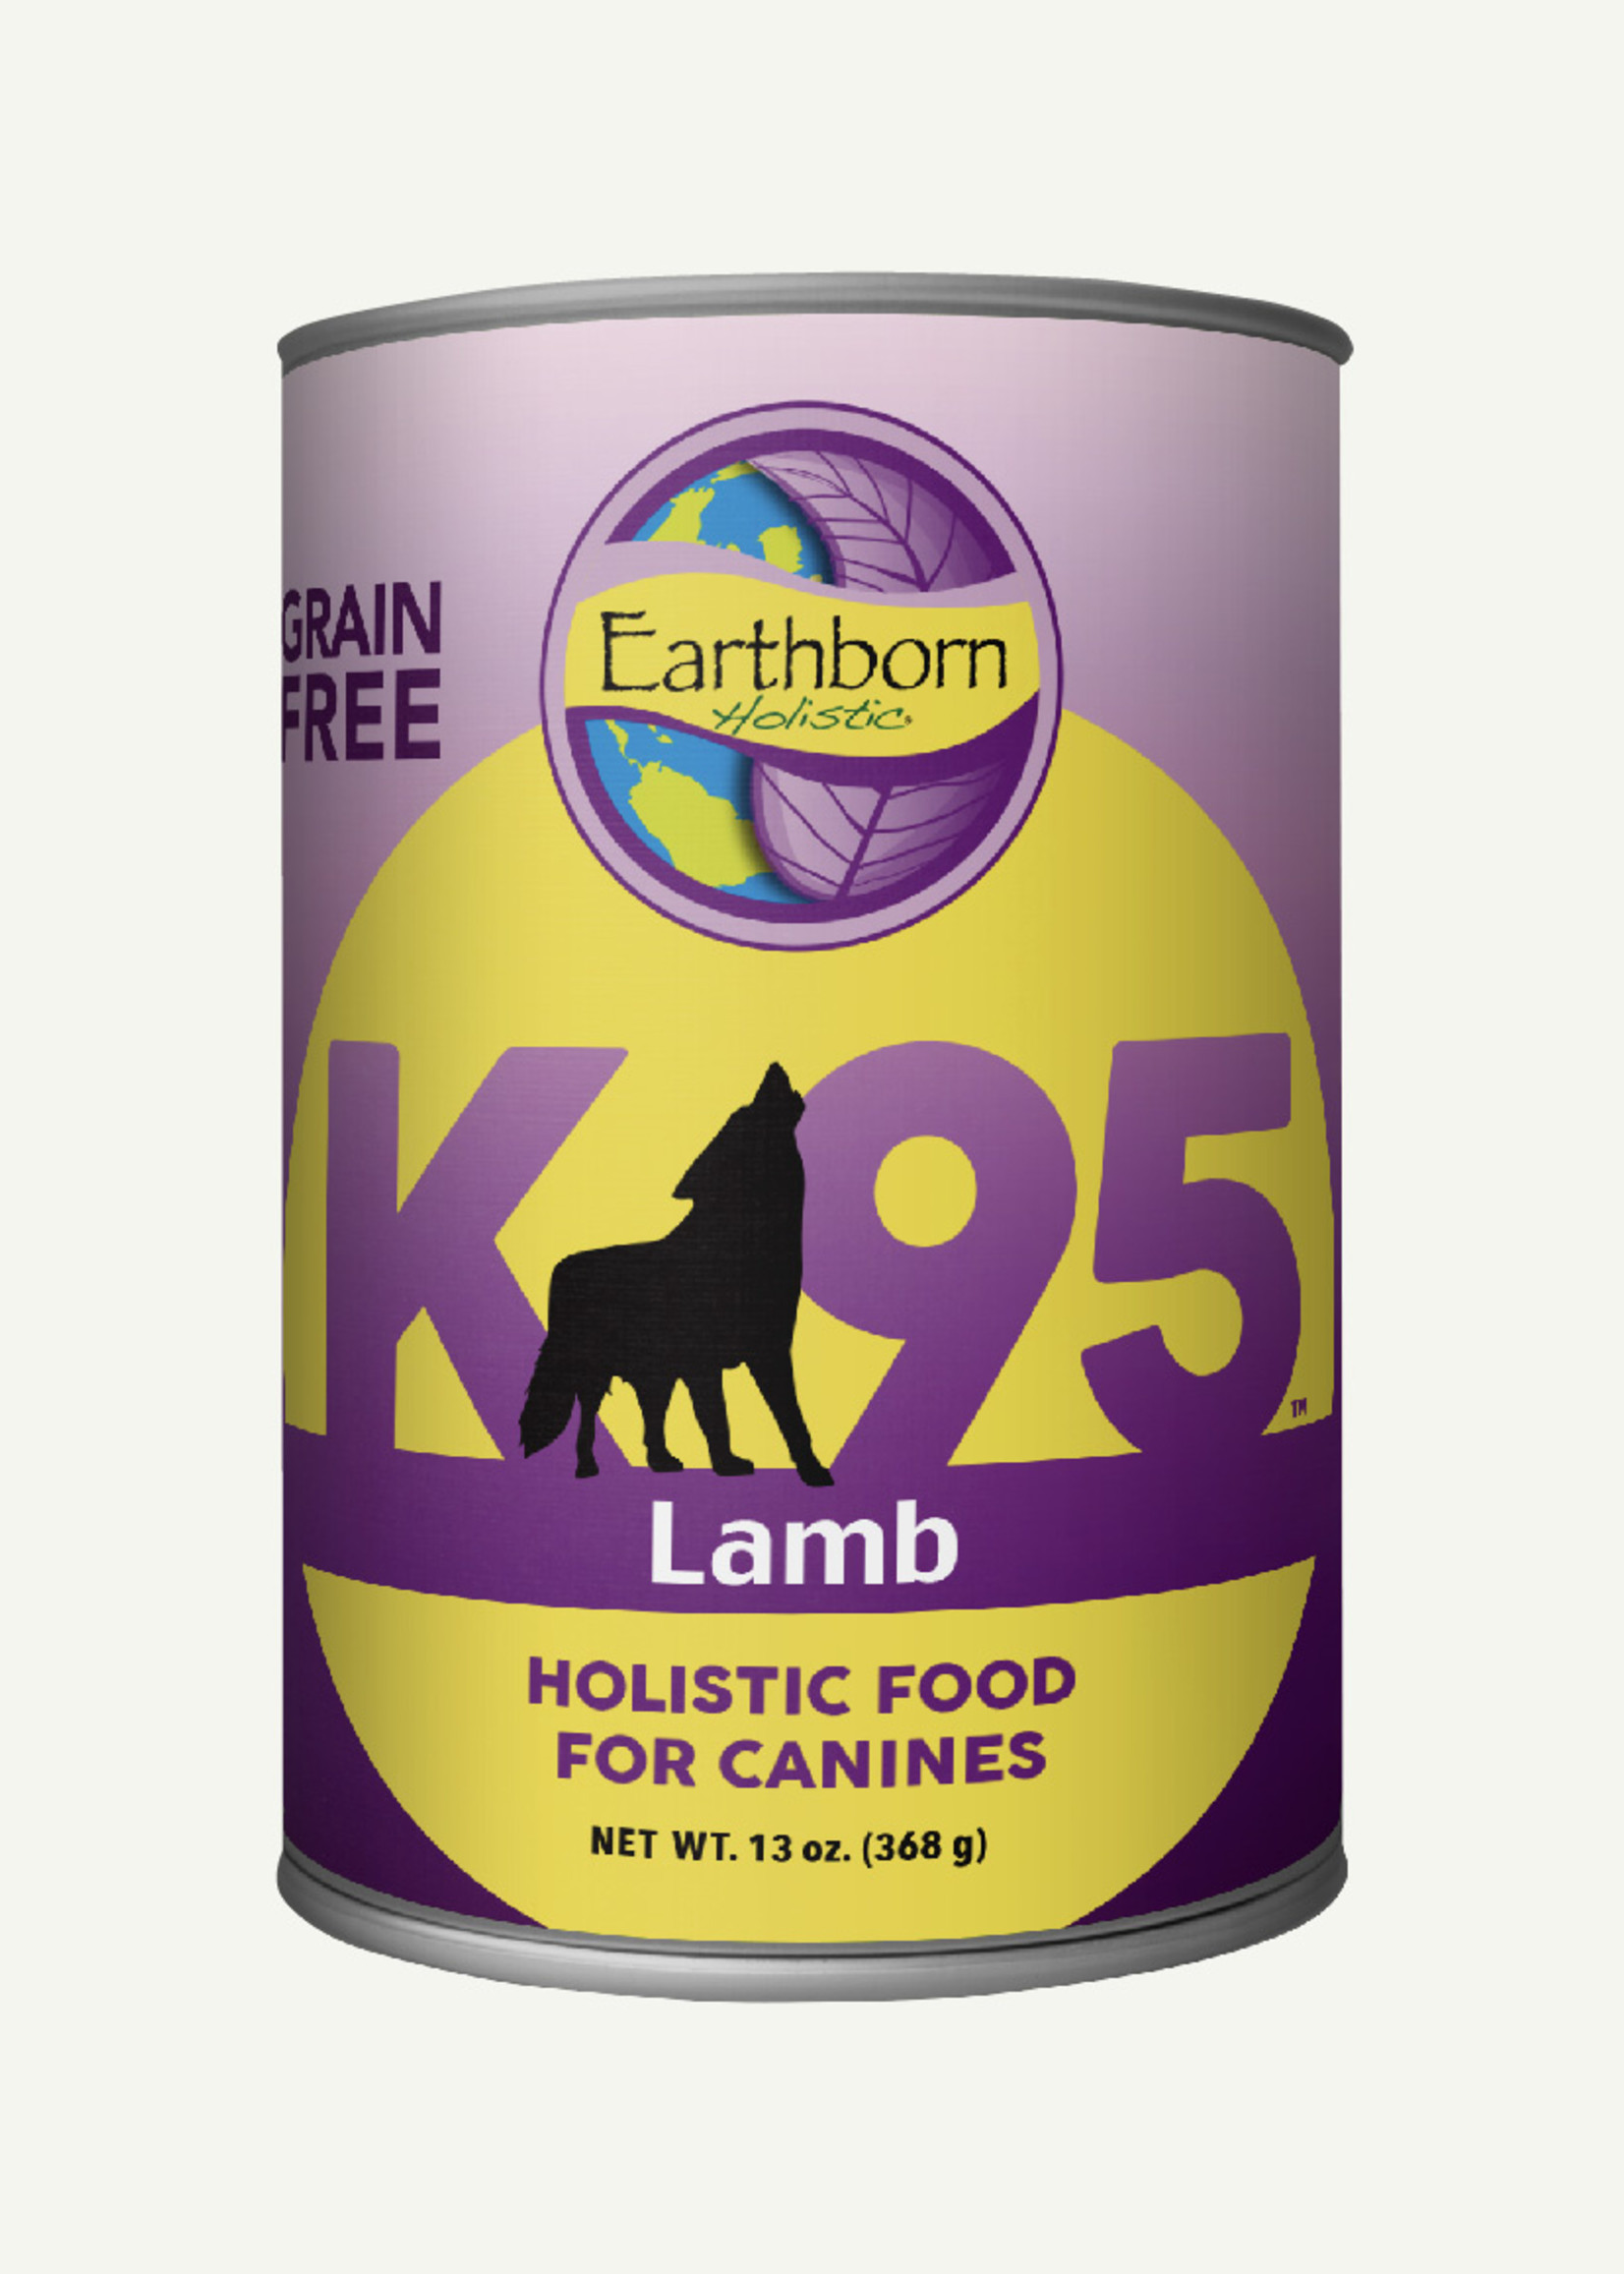 Earthborn Earthborn K95 Lamb Grain Free 13 oz